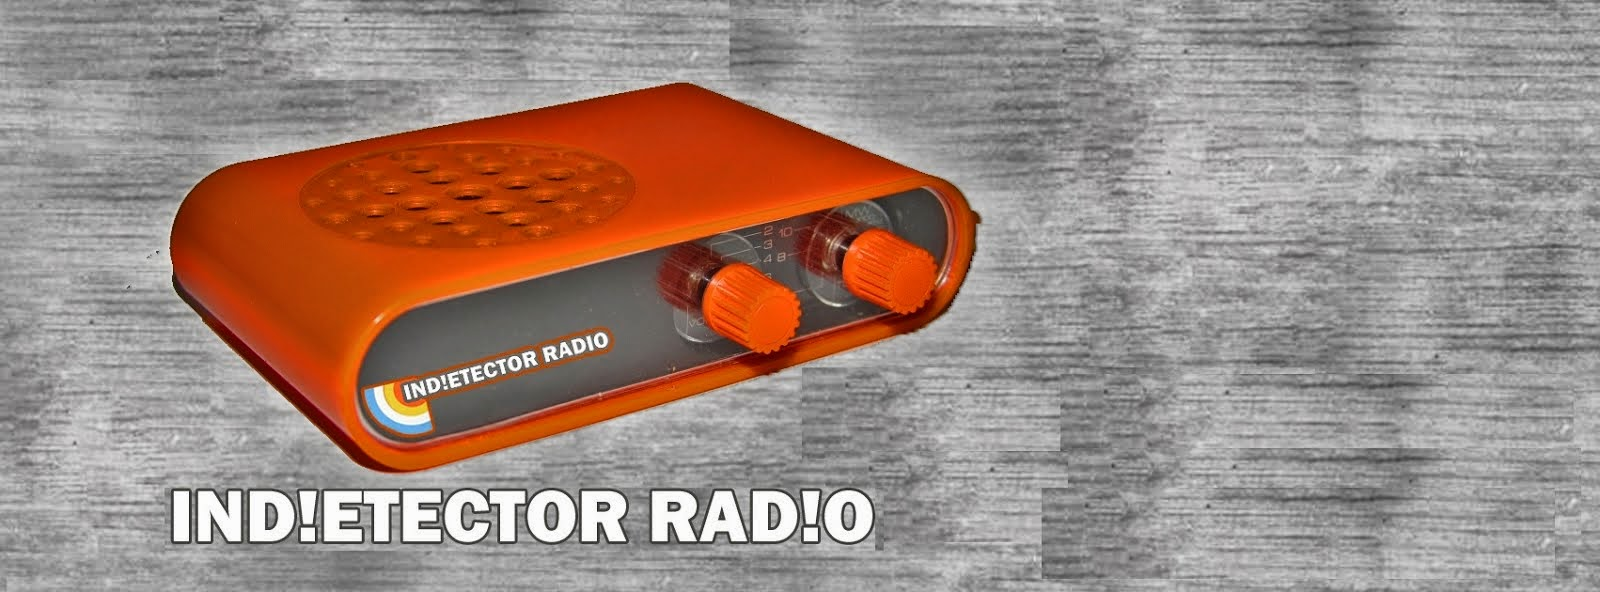 Indietector Radio